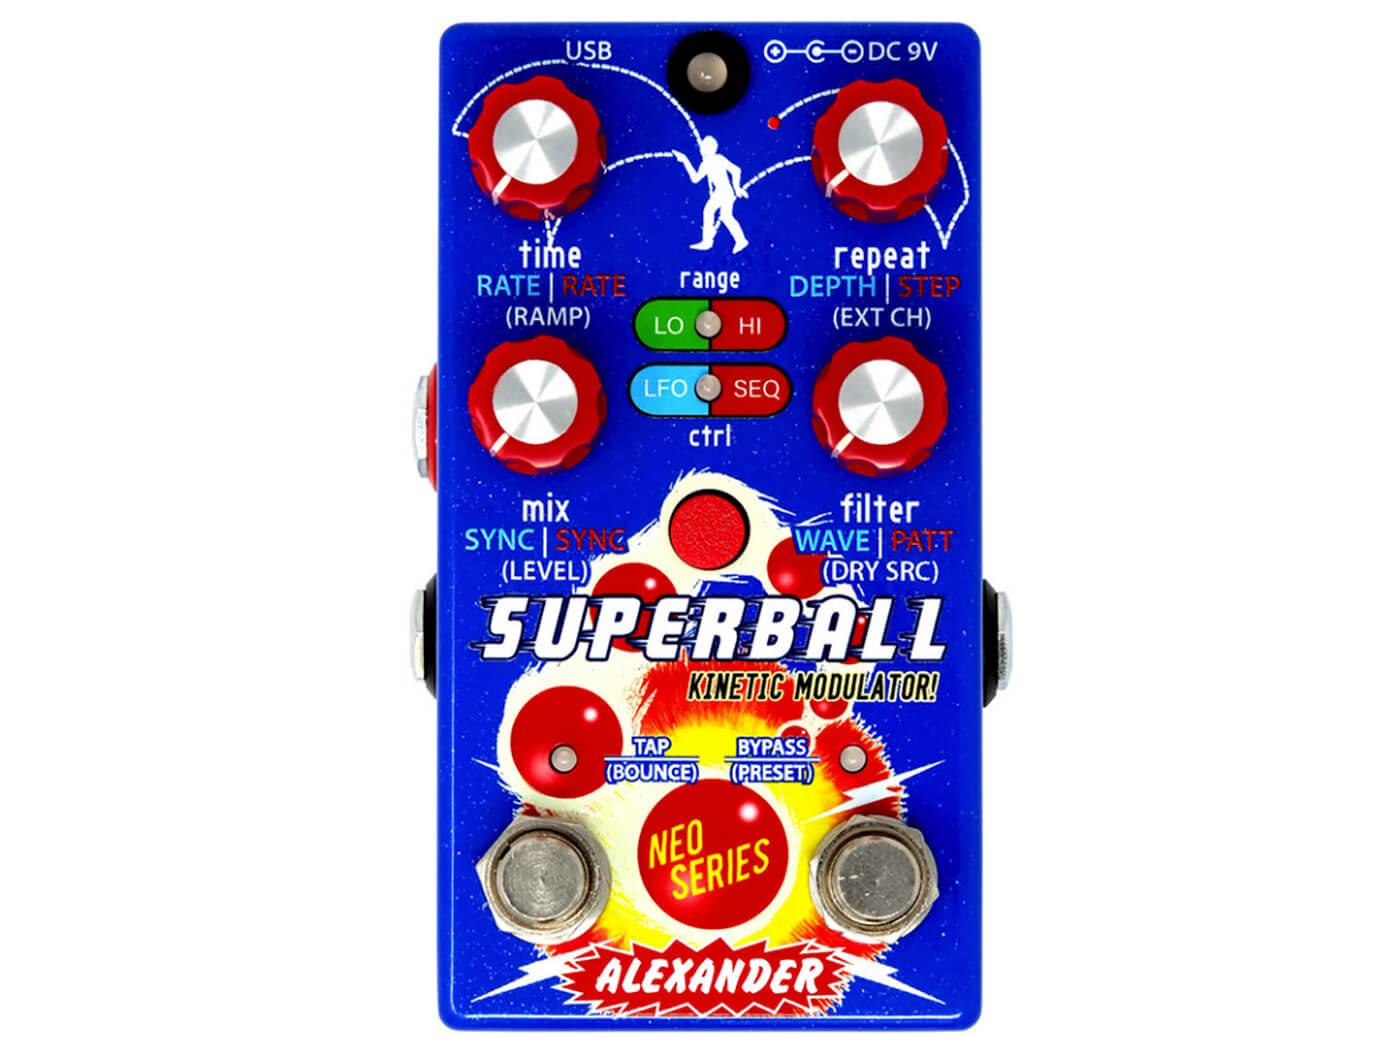 Alexander Pedals Superball Kinetic Modulator